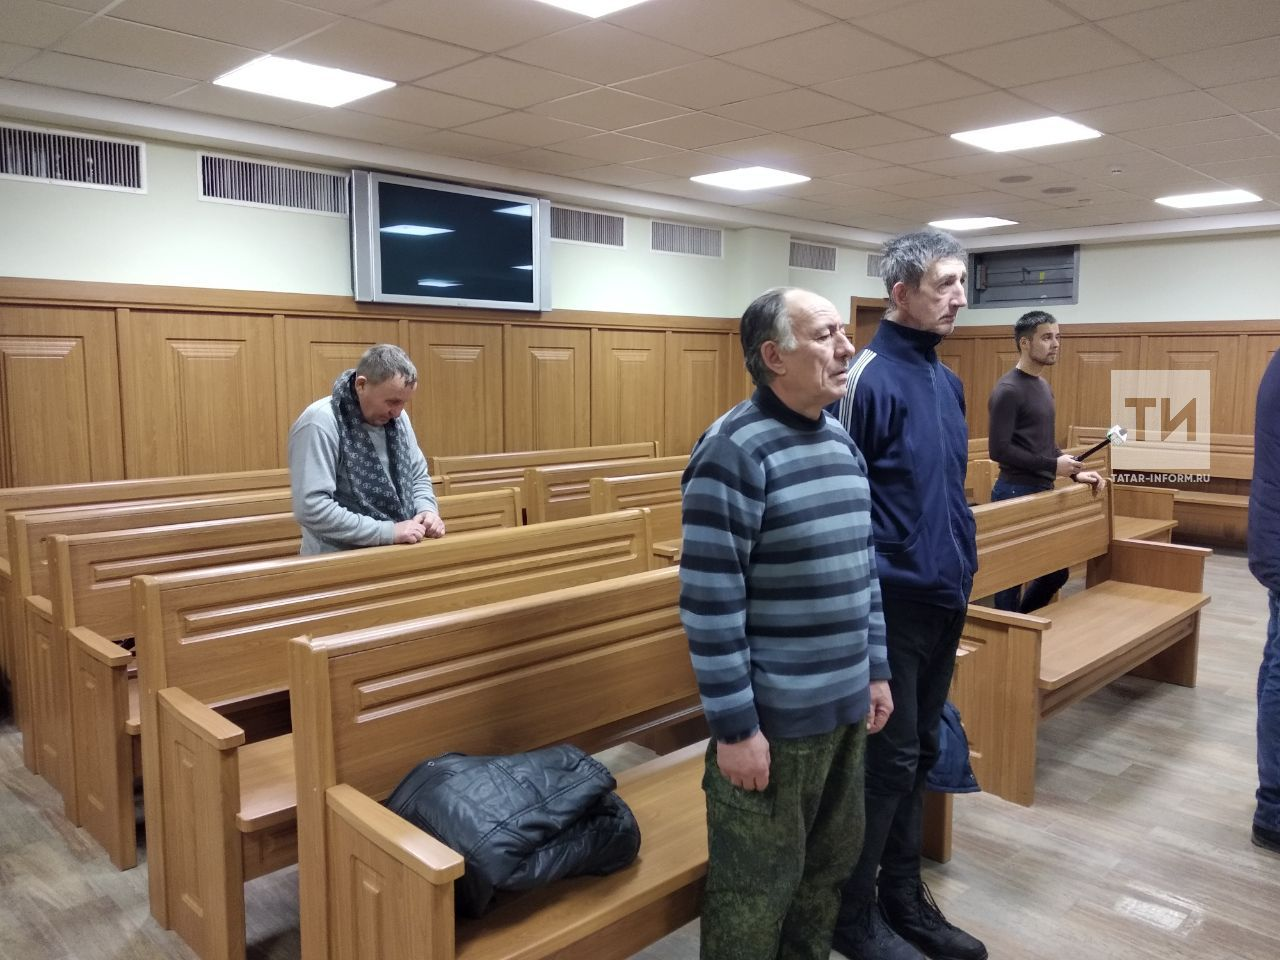 https://www.tatar-inform.ru/upload/image/2018/11/29/034.jpg